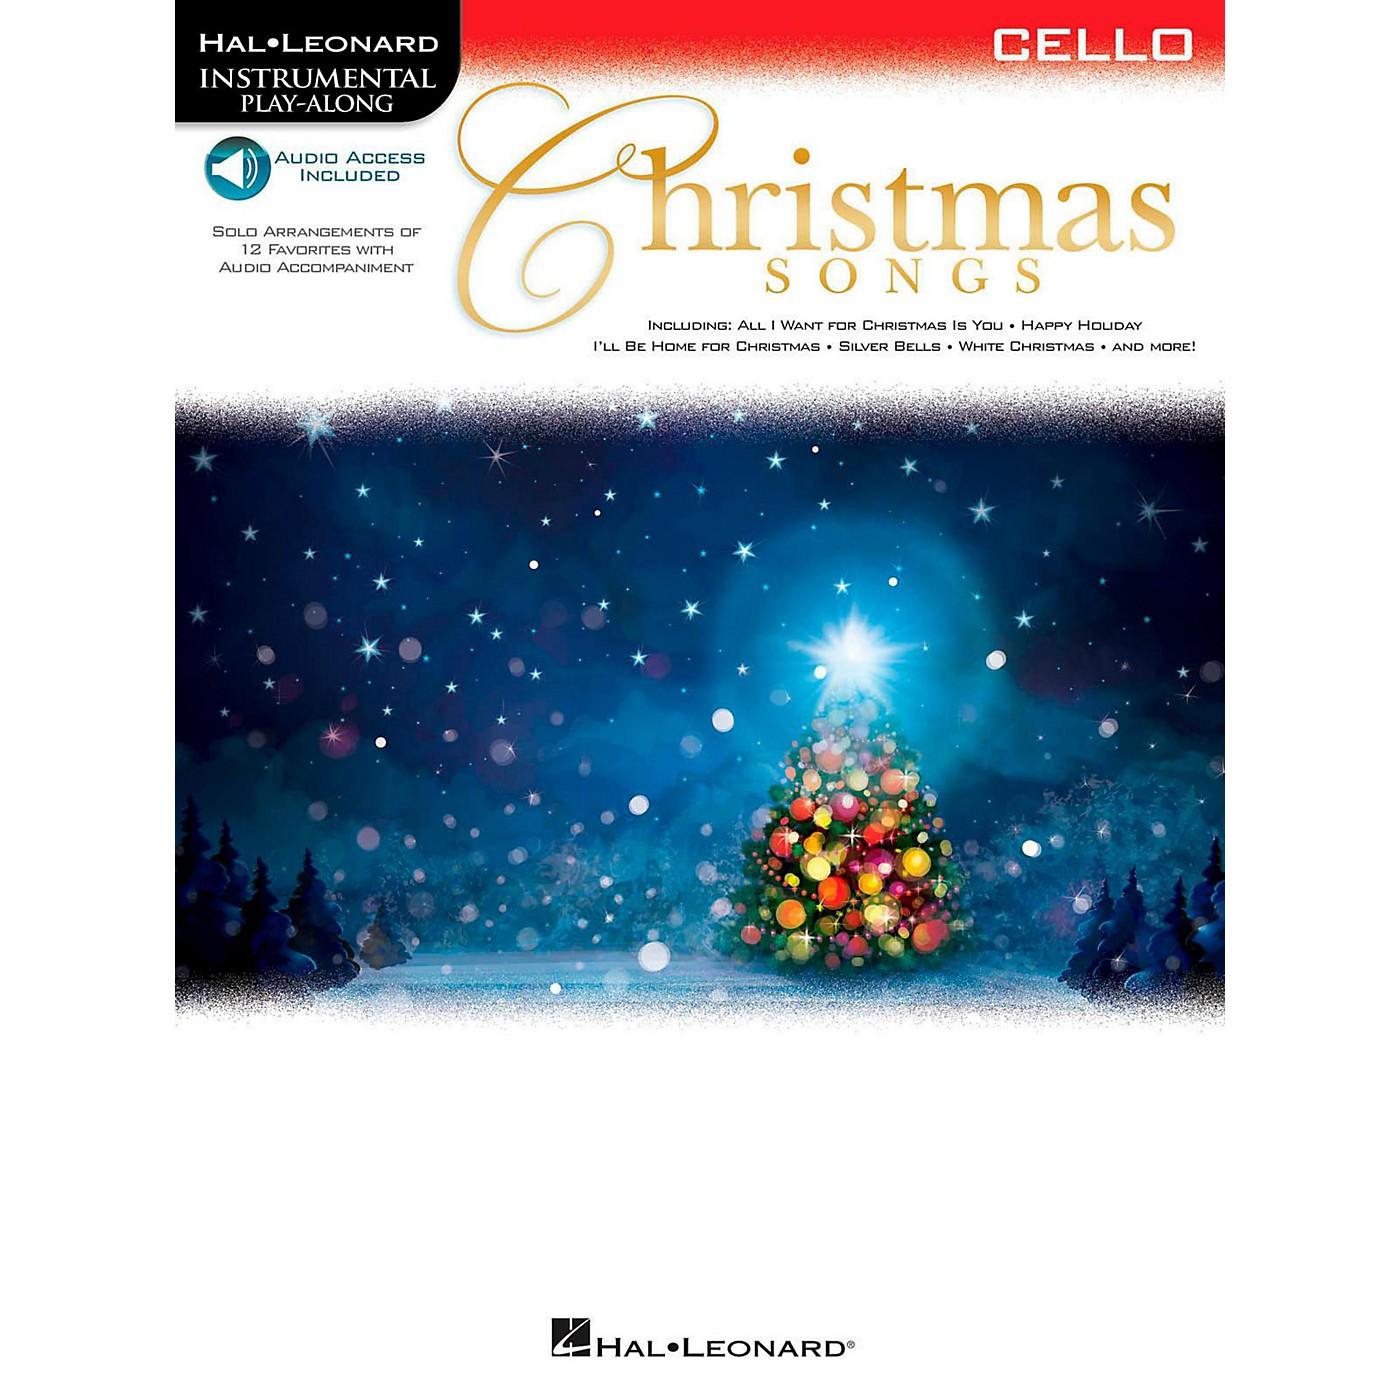 Hal Leonard Christmas Songs For Cello - Instrumental Play-Along (Book/Audio On-Line) thumbnail